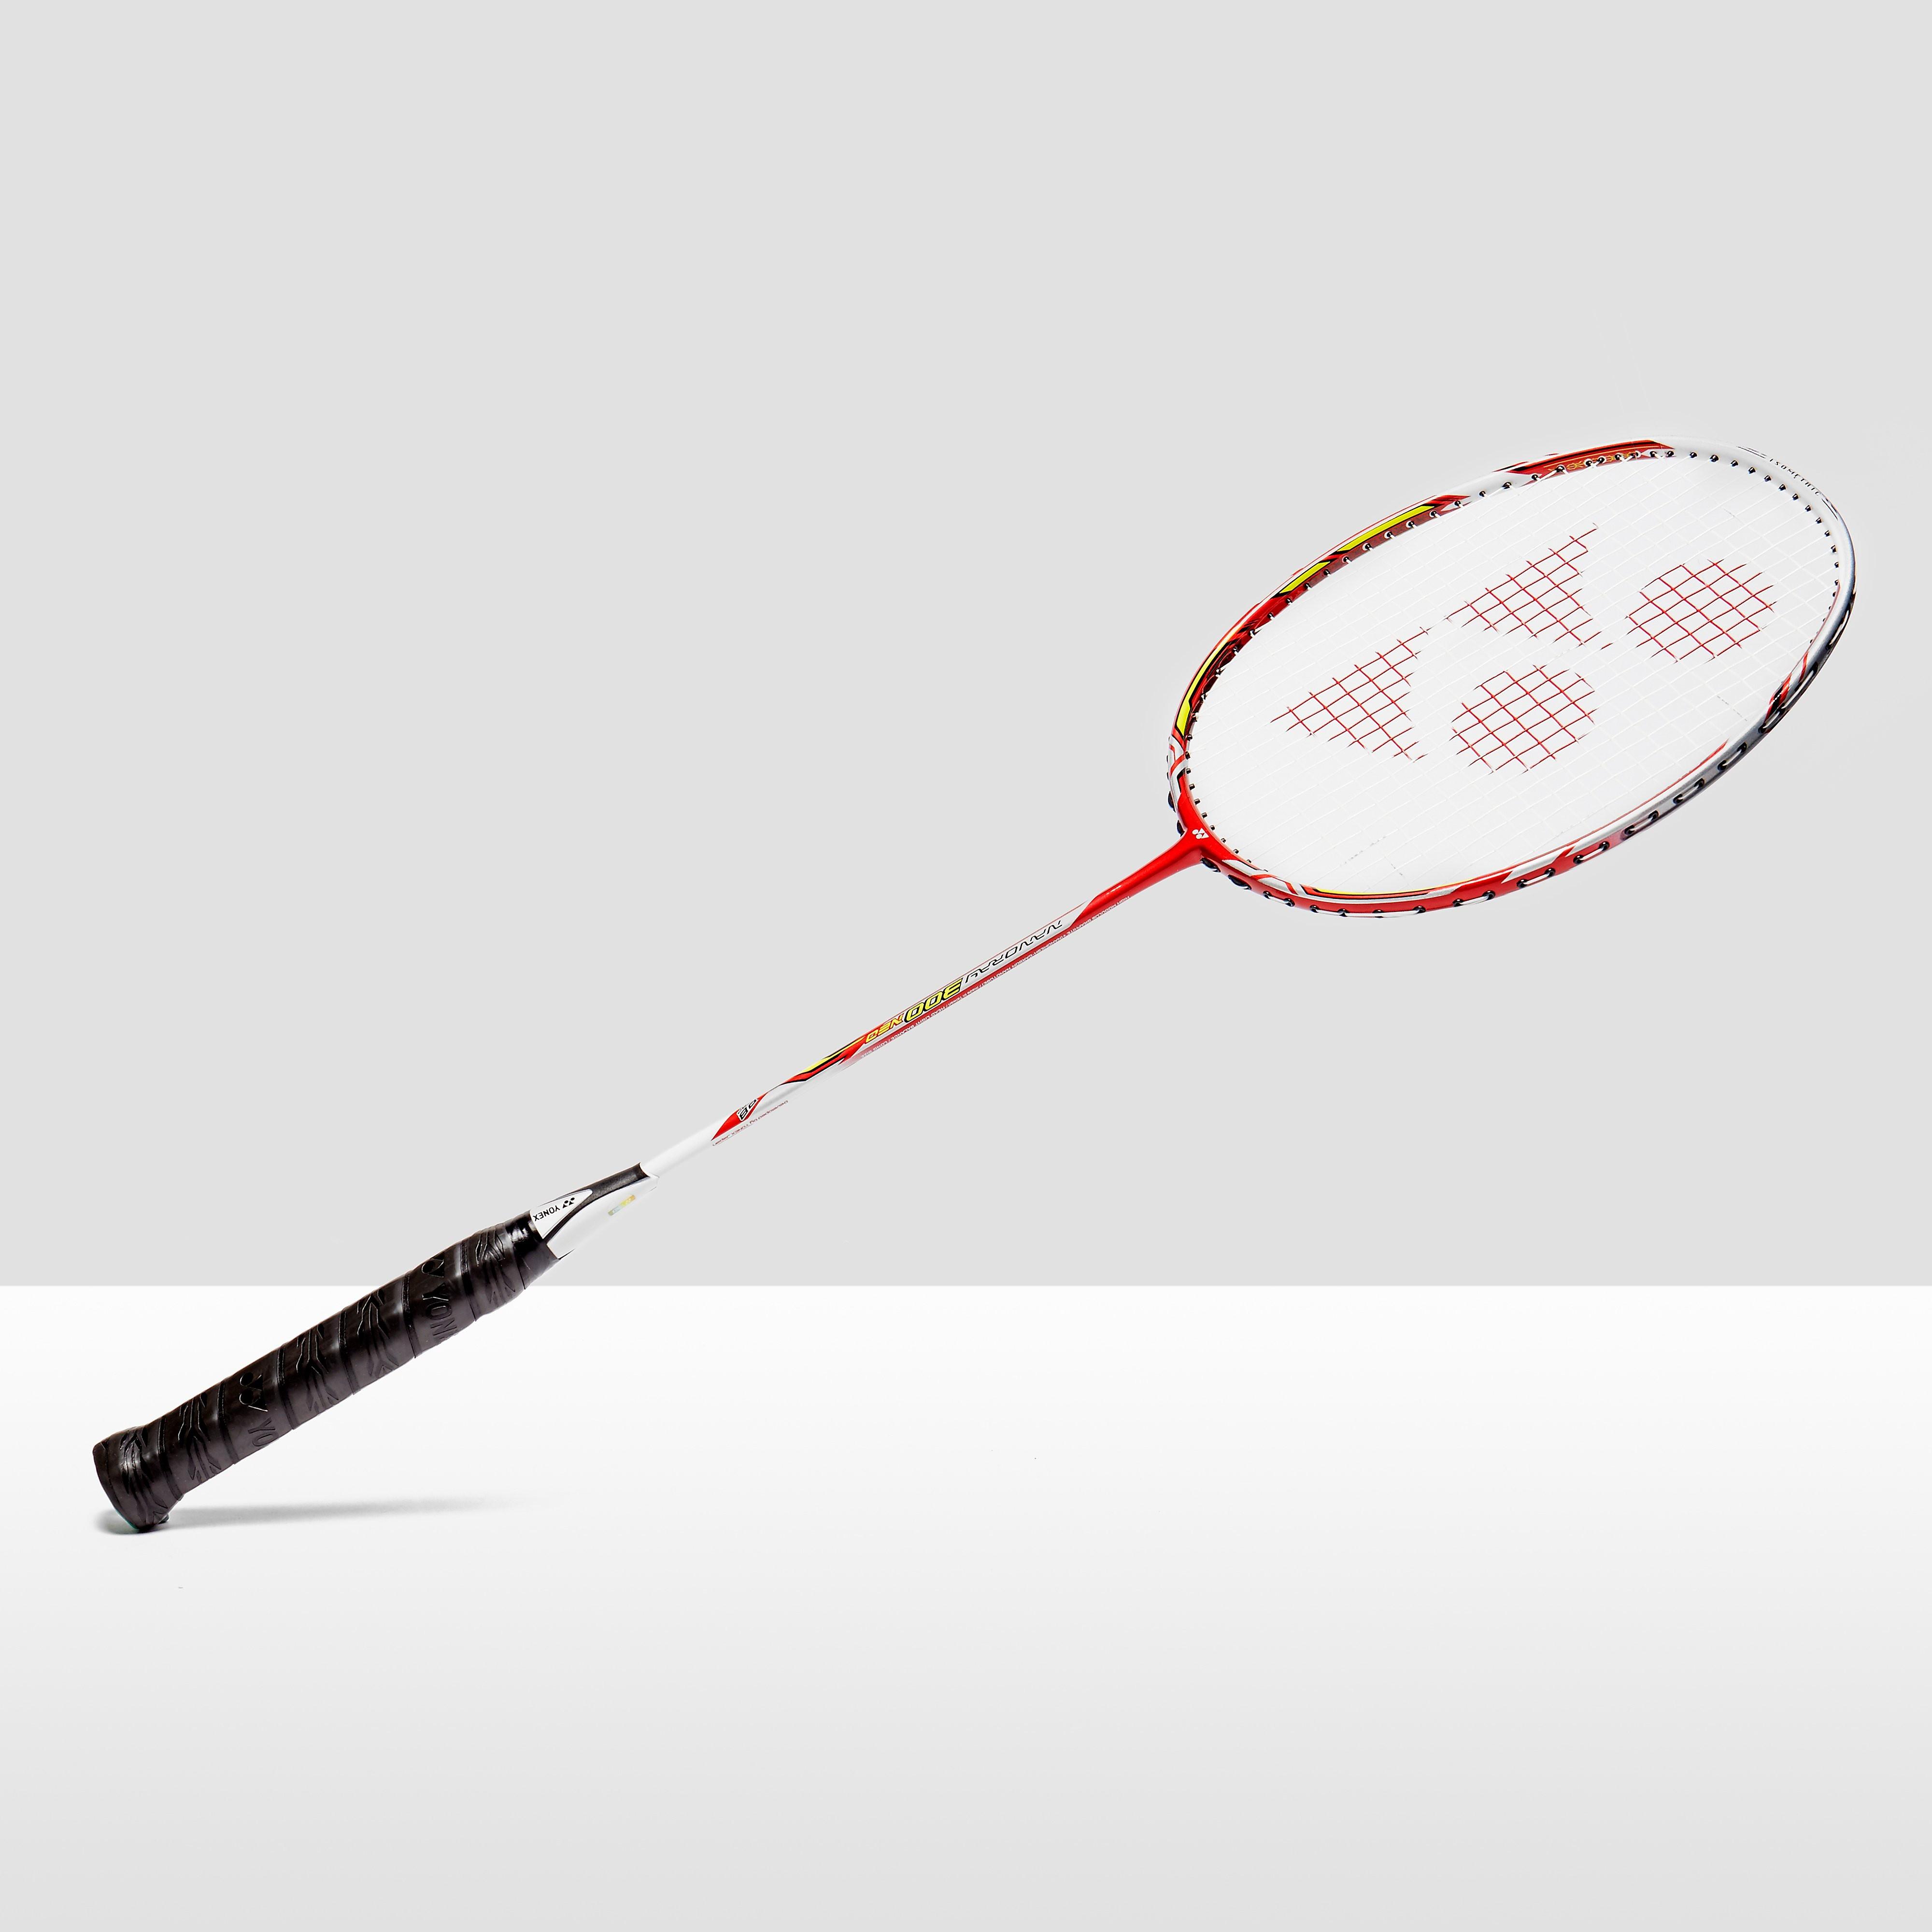 Yonex Nanoray 300 Badminton Racket